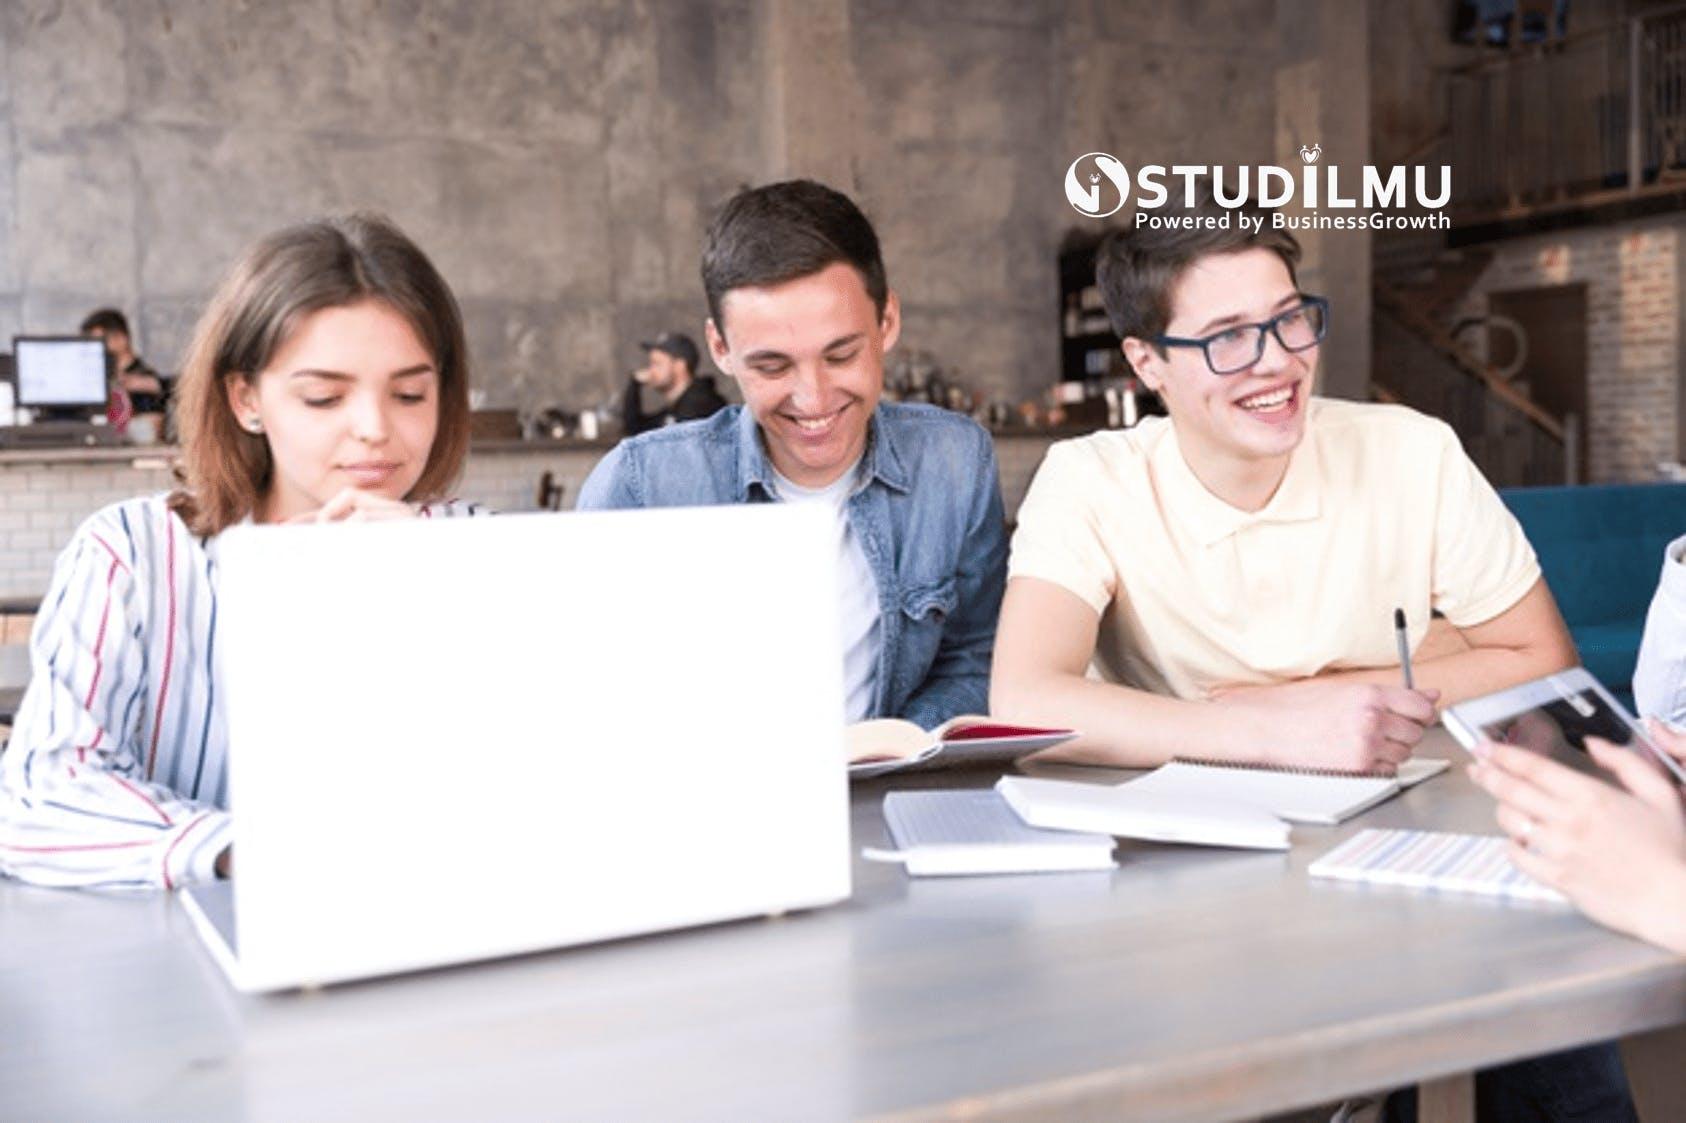 STUDILMU Career Advice - 10 Perilaku Orang Pintar